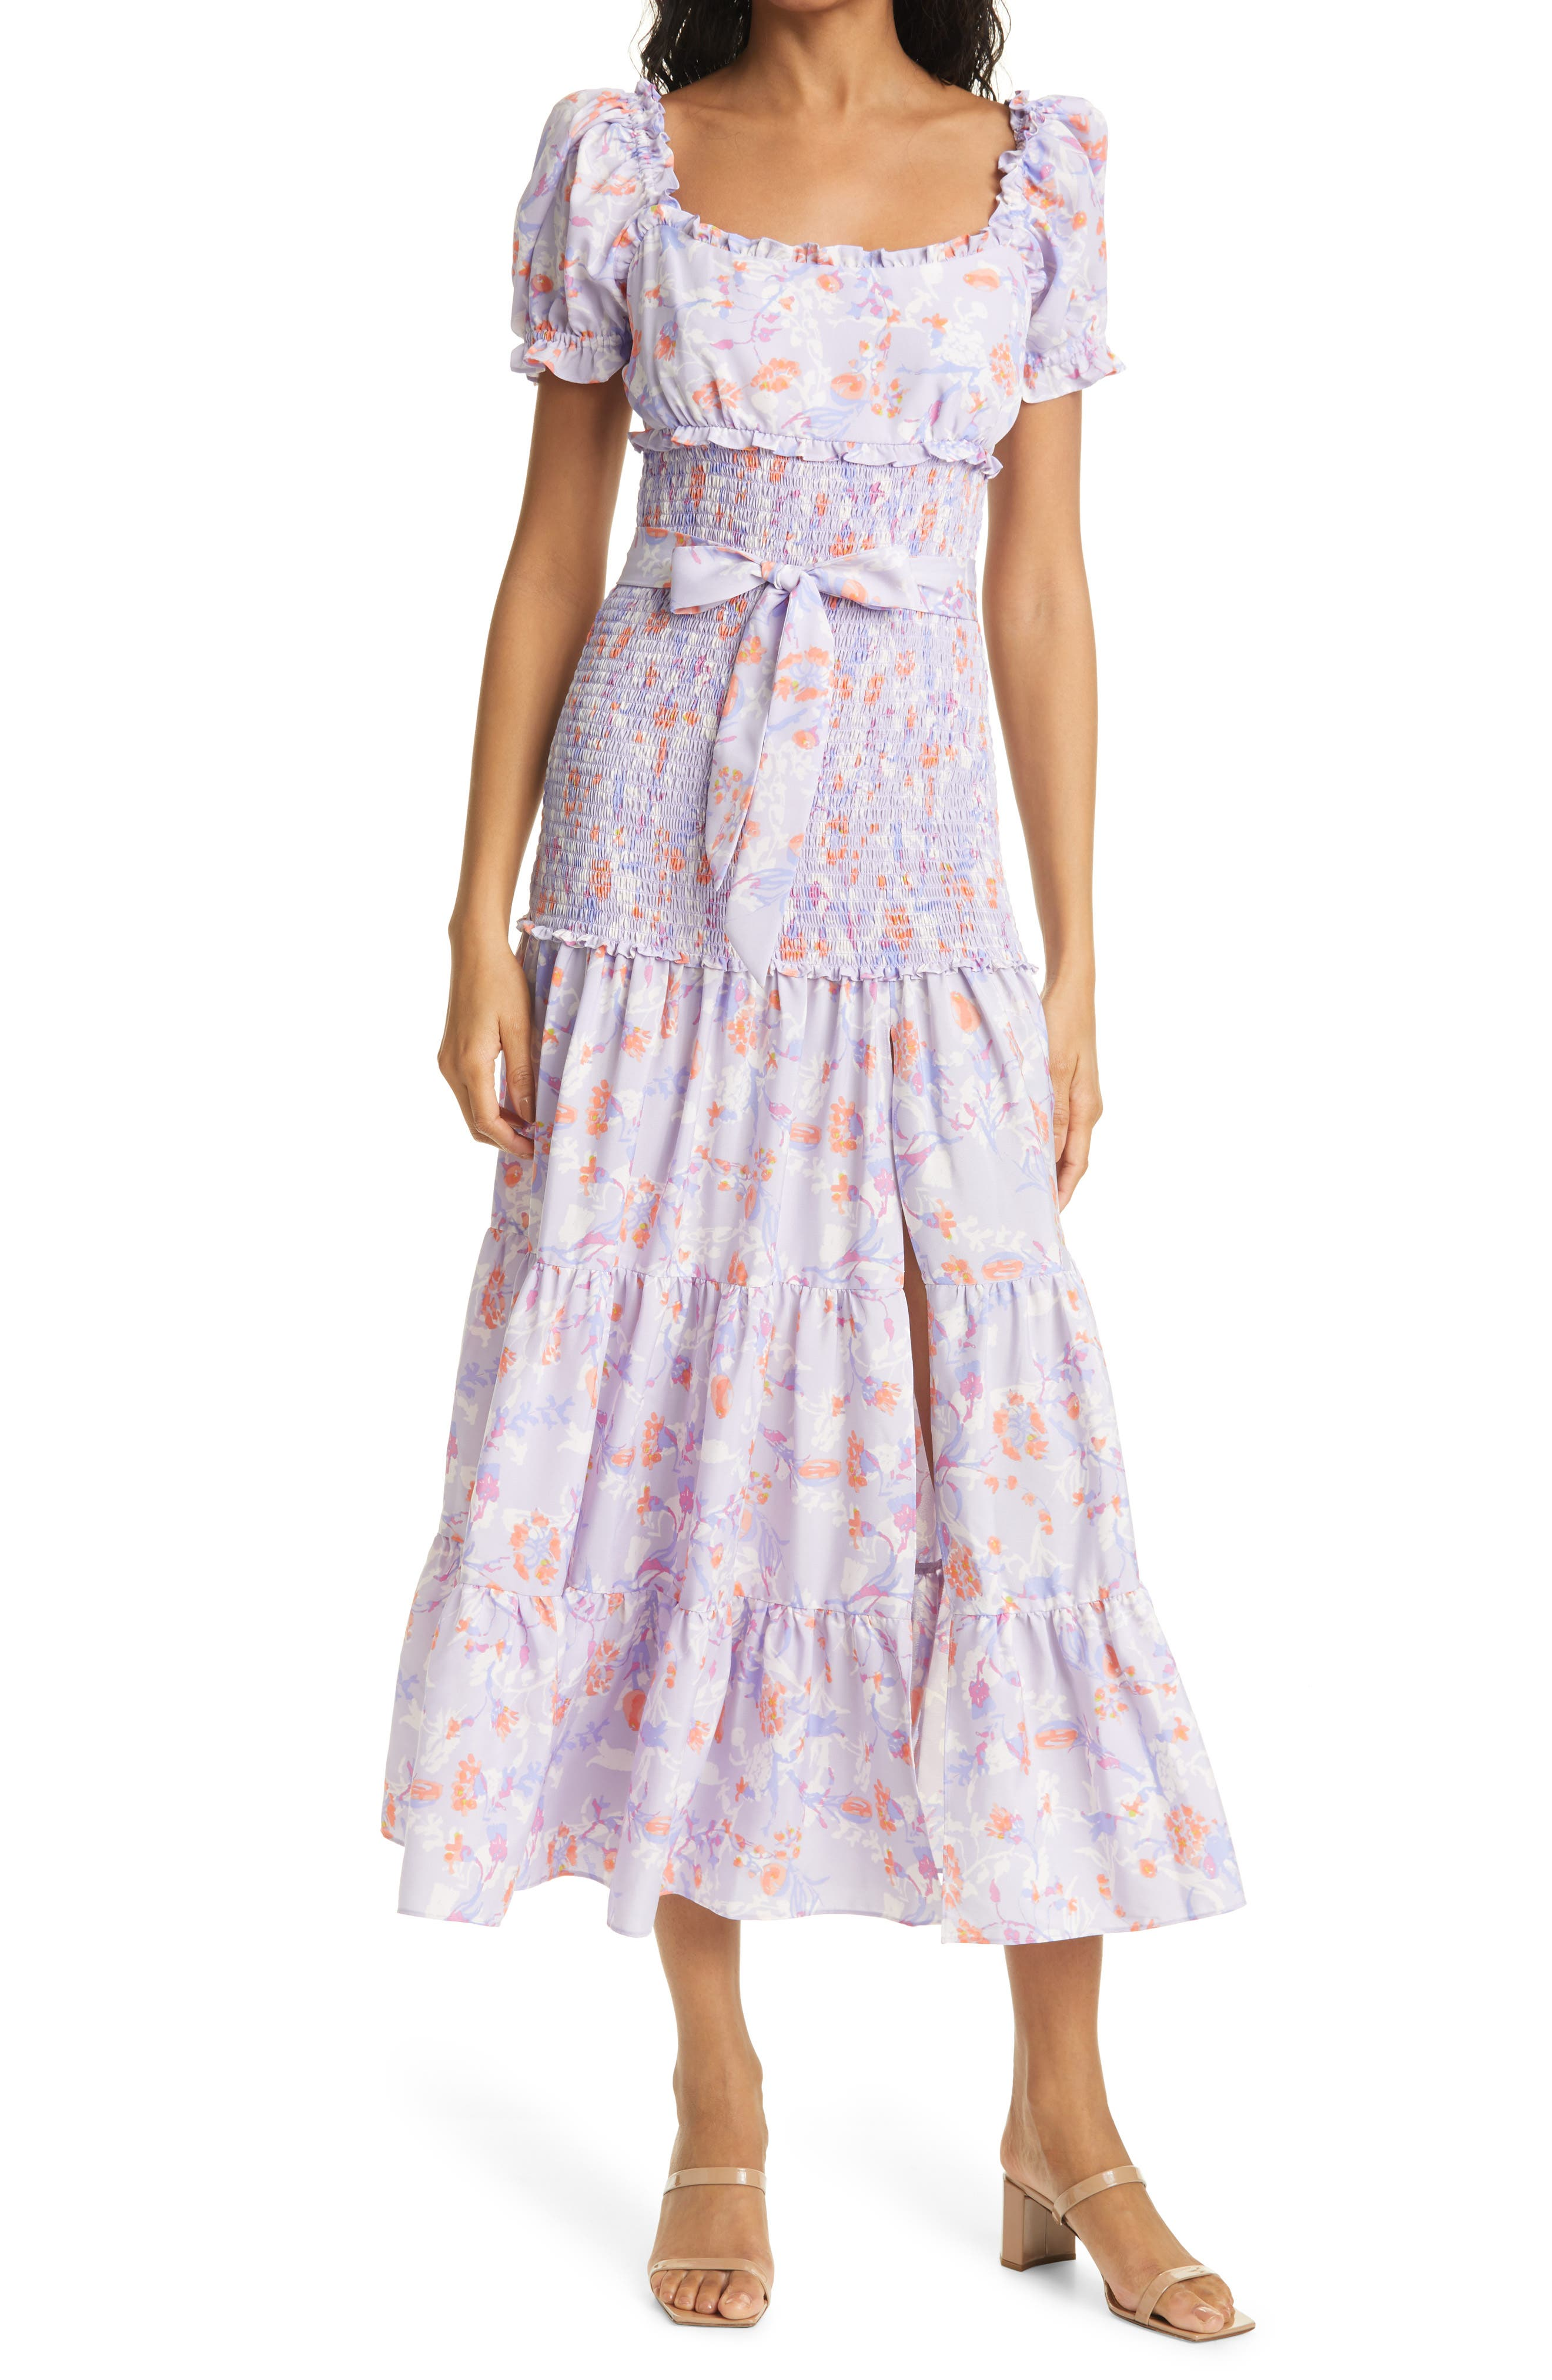 Taylor Floral Smocked & Belted Tiered Dress